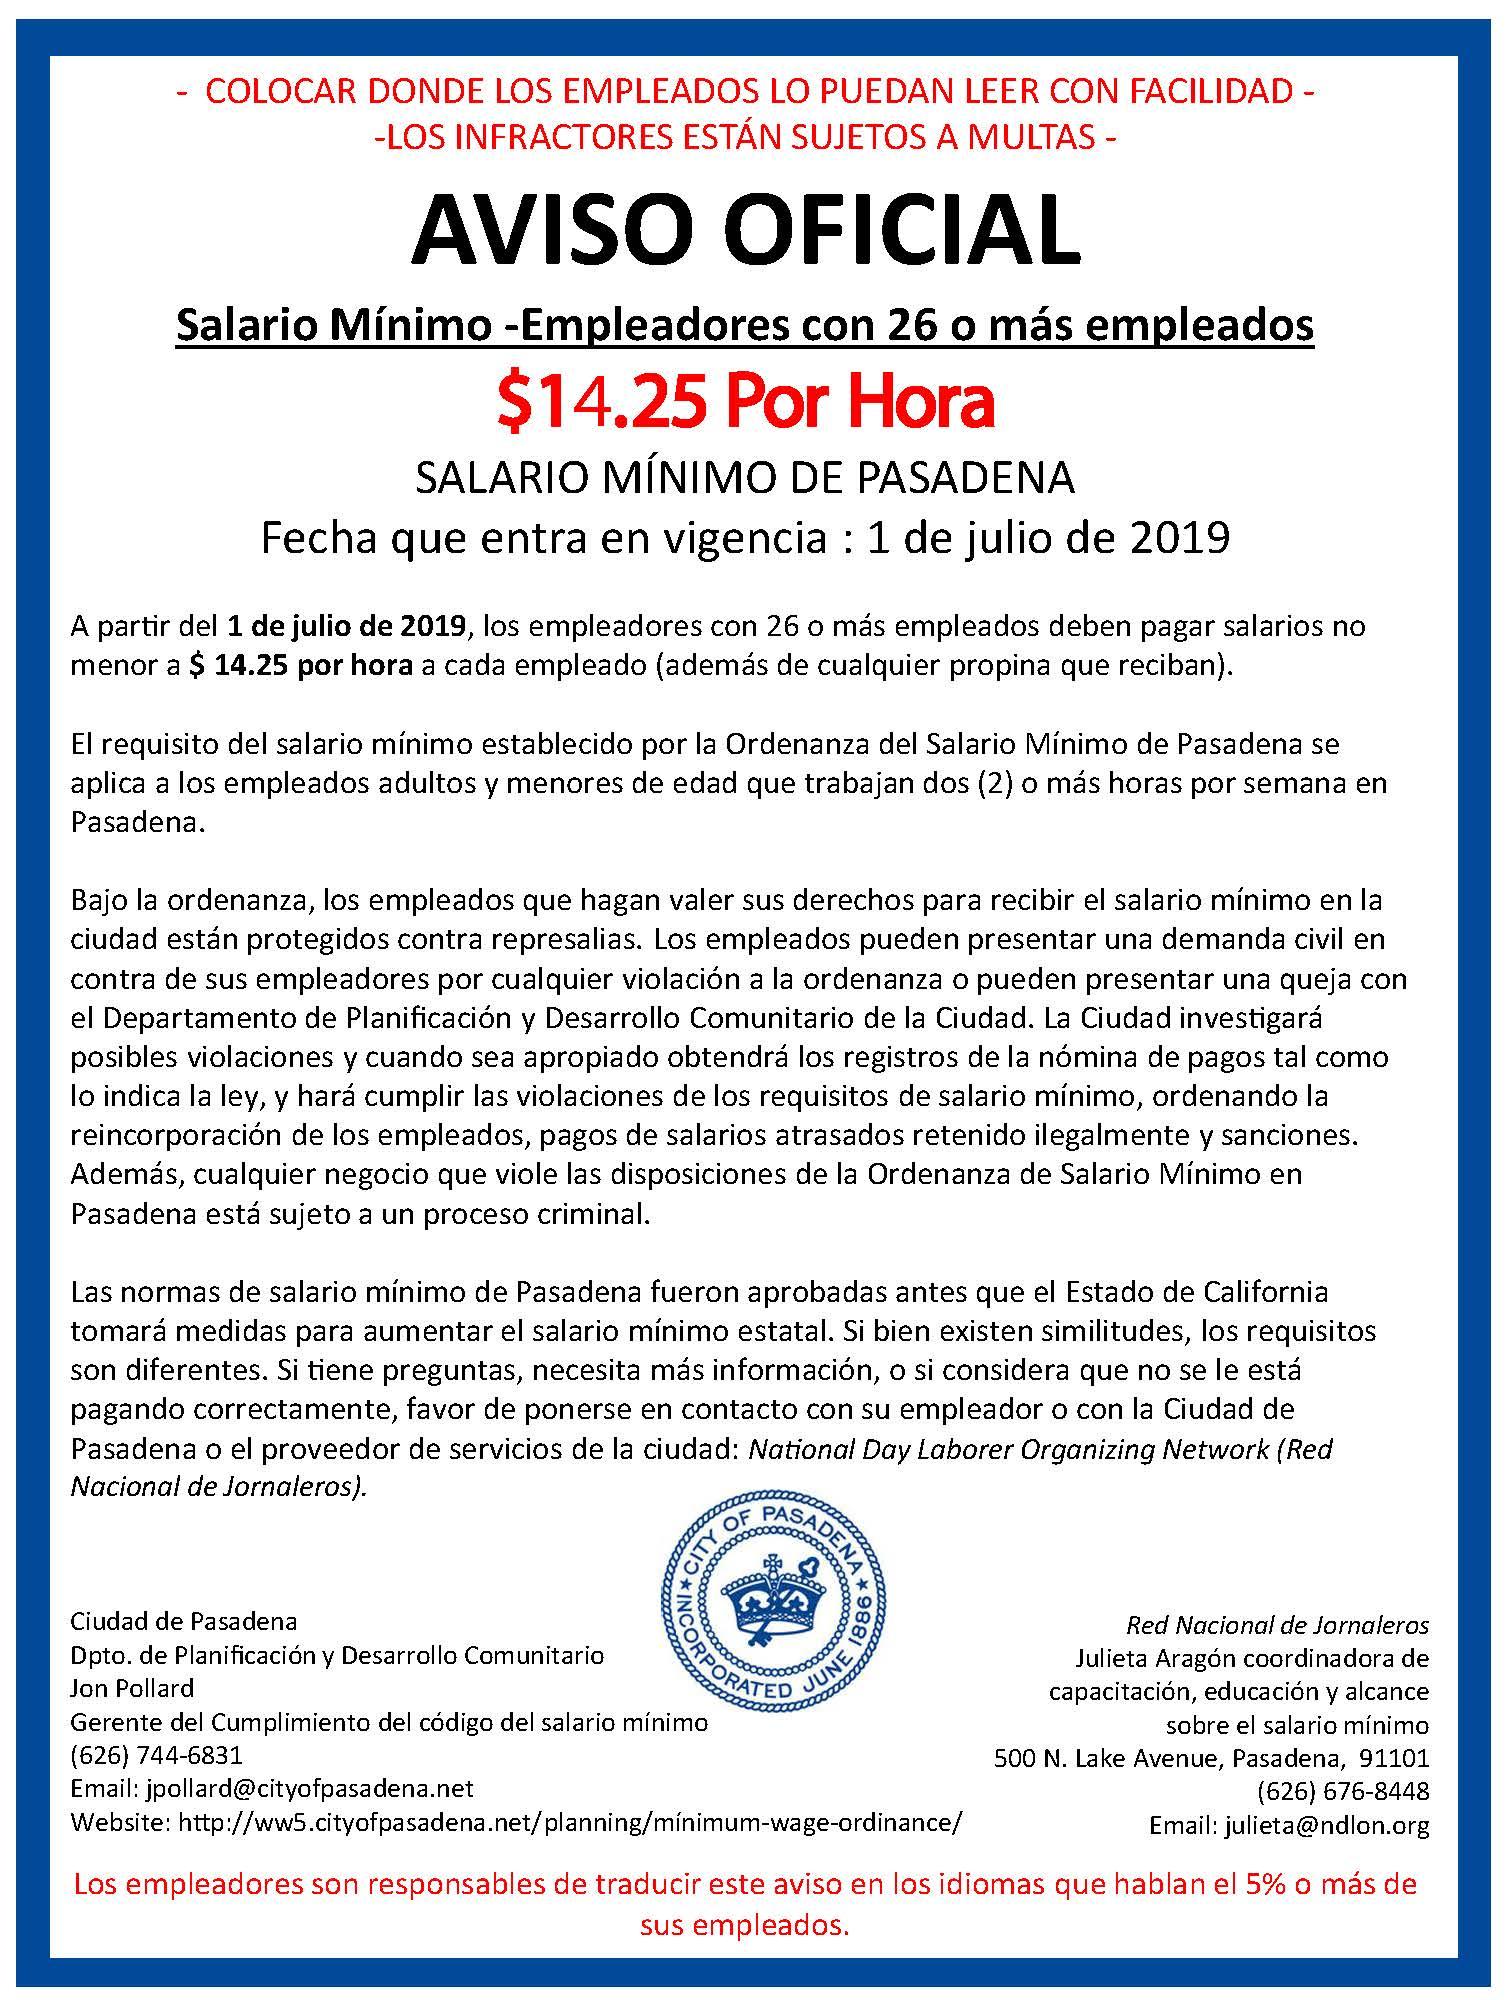 Minimum Wage Information - Planning & Community Development